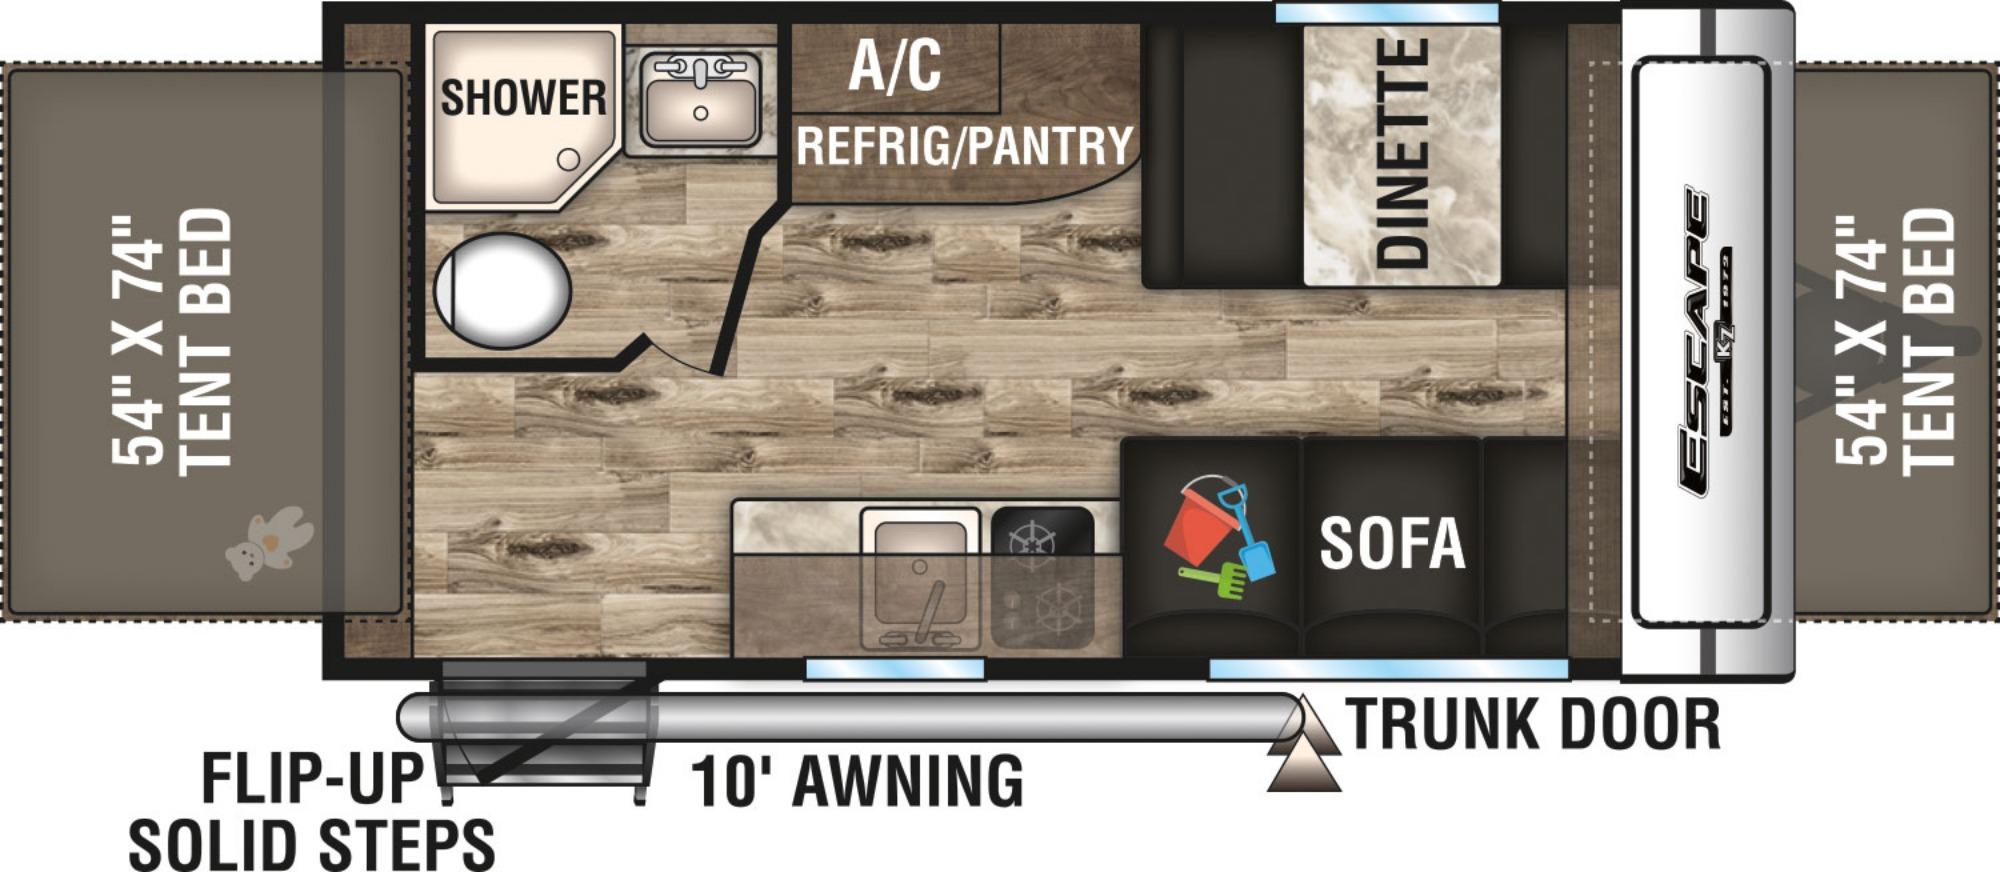 View Floor Plan for 2019 K-Z RV ESCAPE 160RBT